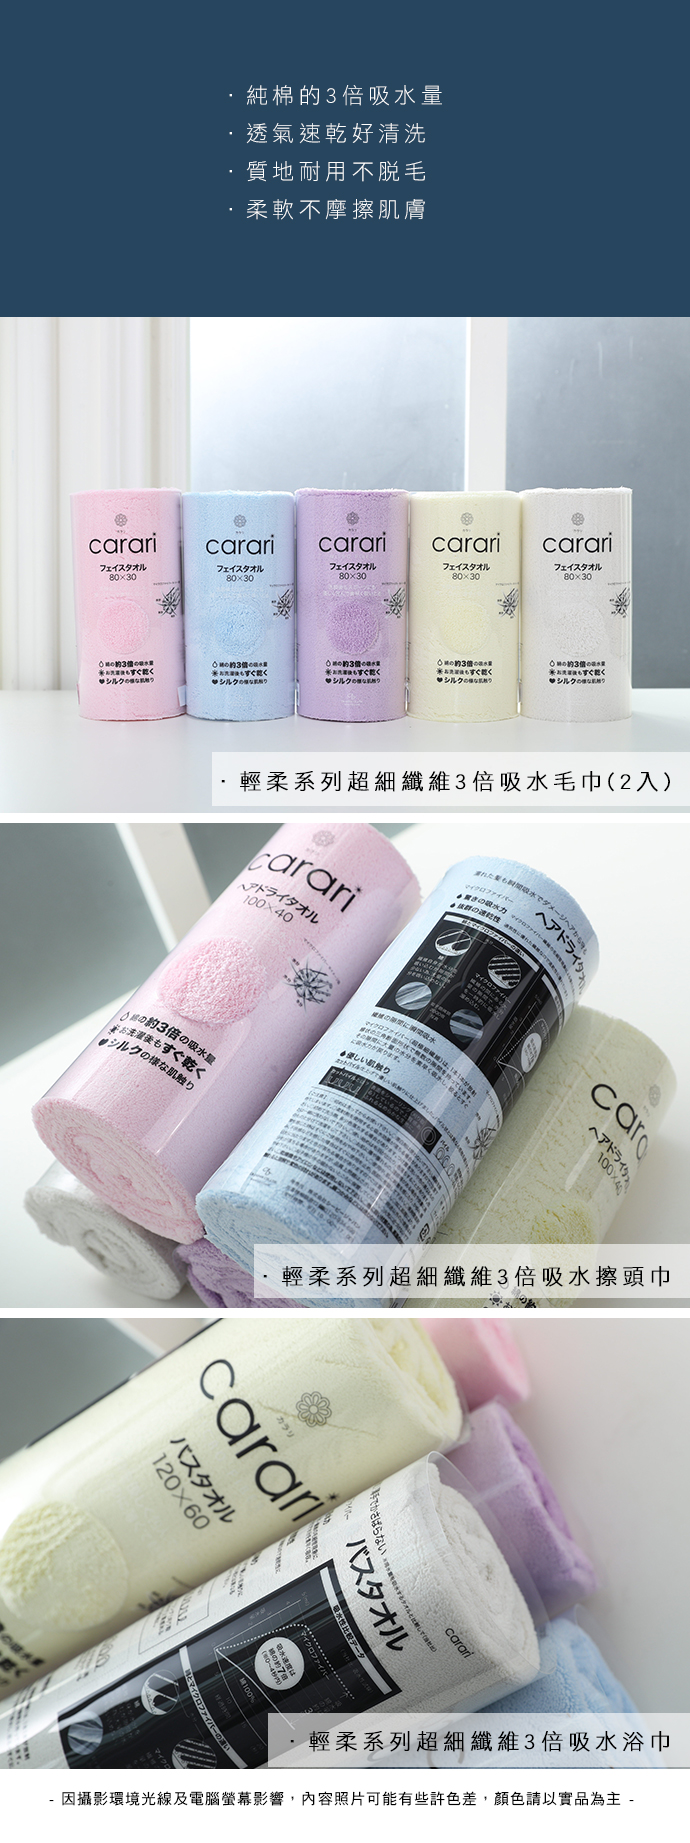 CB Japan|輕柔系列超細纖維3倍吸水擦頭巾 - 甜心藍